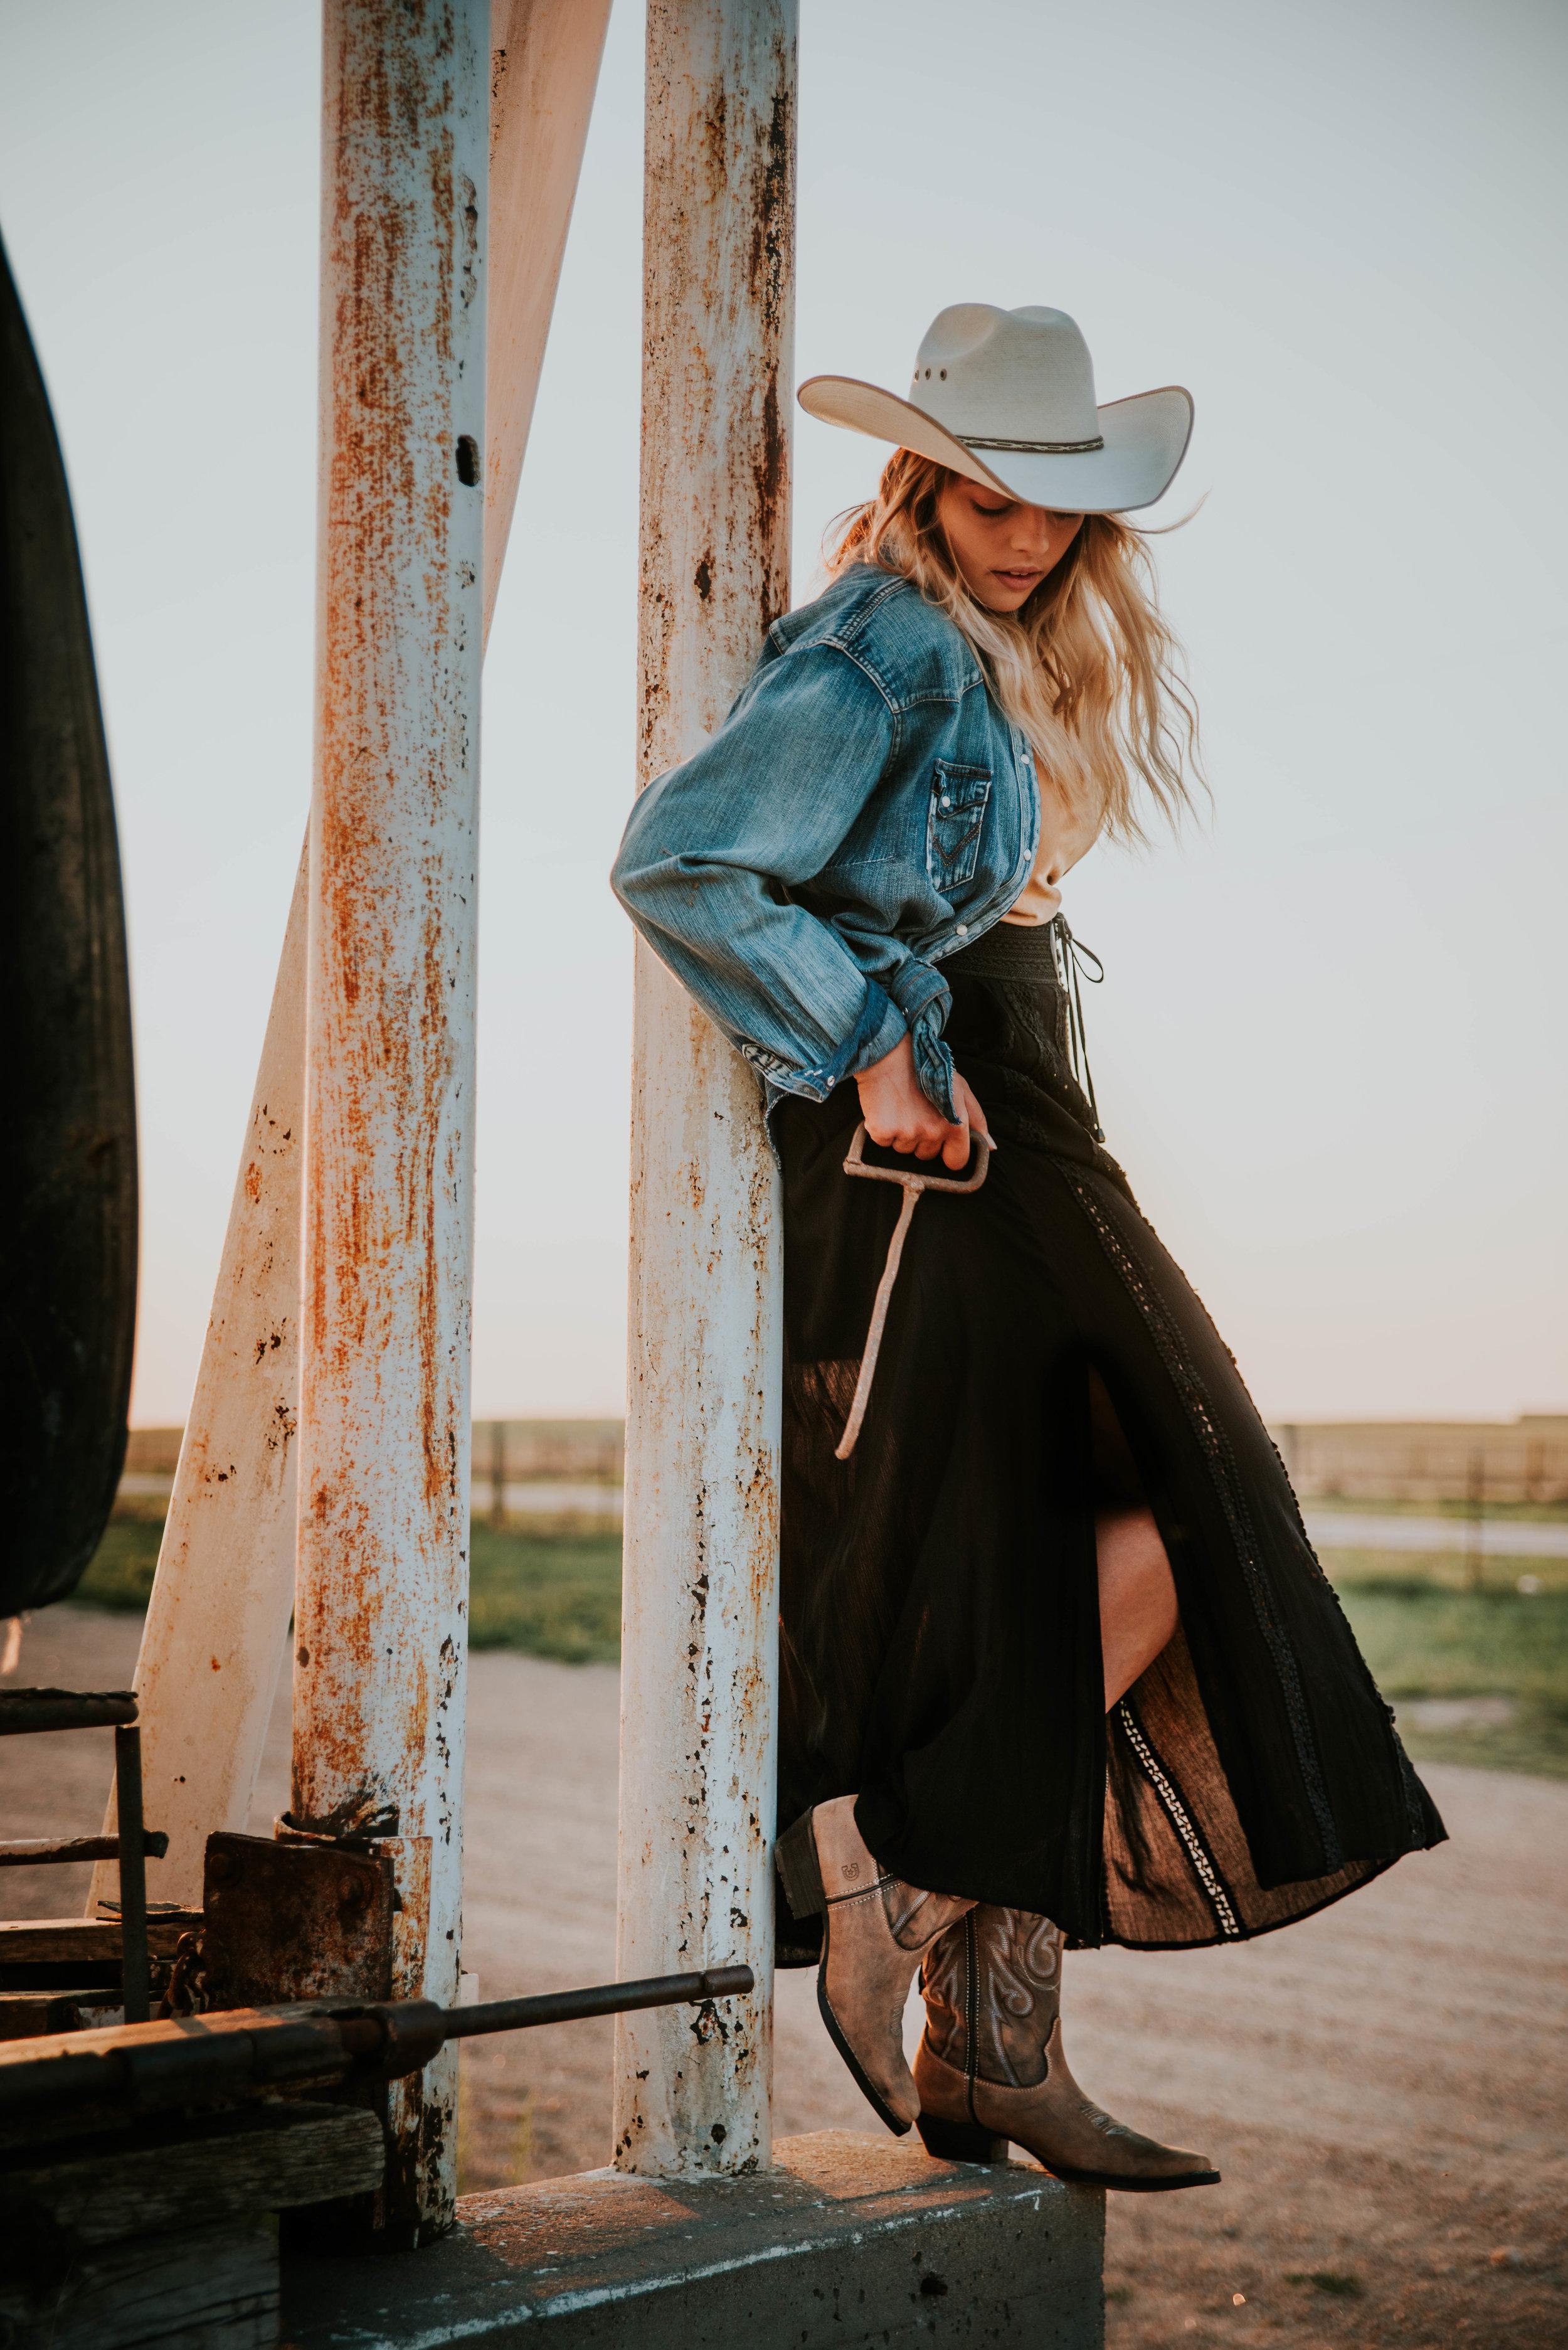 Miss. Miller's Photography | Lindsay Miller | Durango Boots | Black Western Skirt | Wrangler Fashion | Western Fashion | Cattle | Cowgirl Fashion | Western Senior Pictures